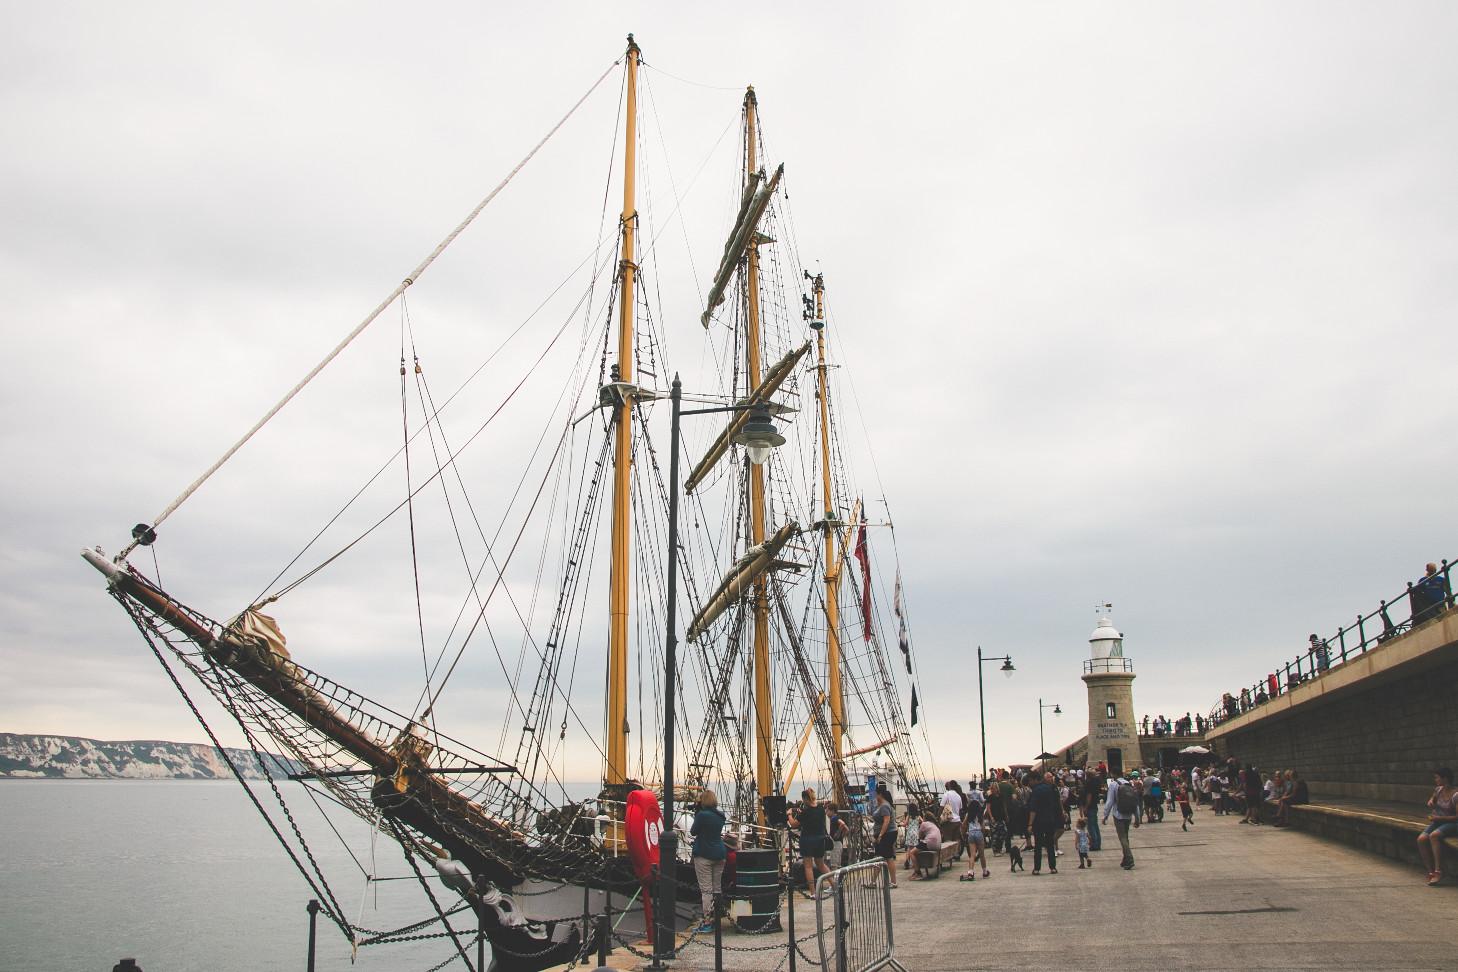 TS Pelican Of London on Folkestone's Harbour Arm